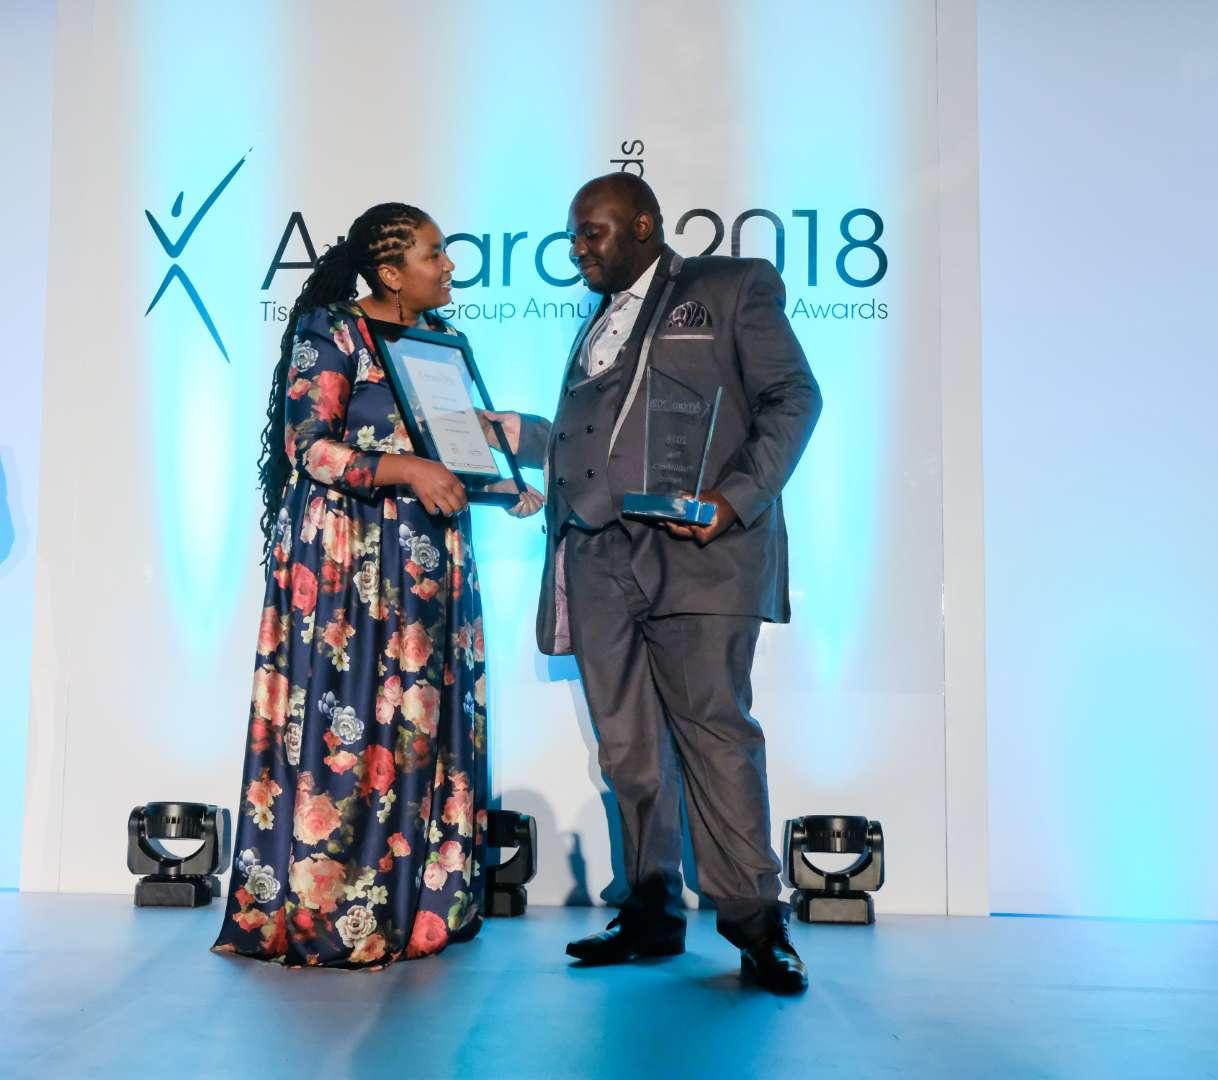 Photo from AMARAS Awards 2018